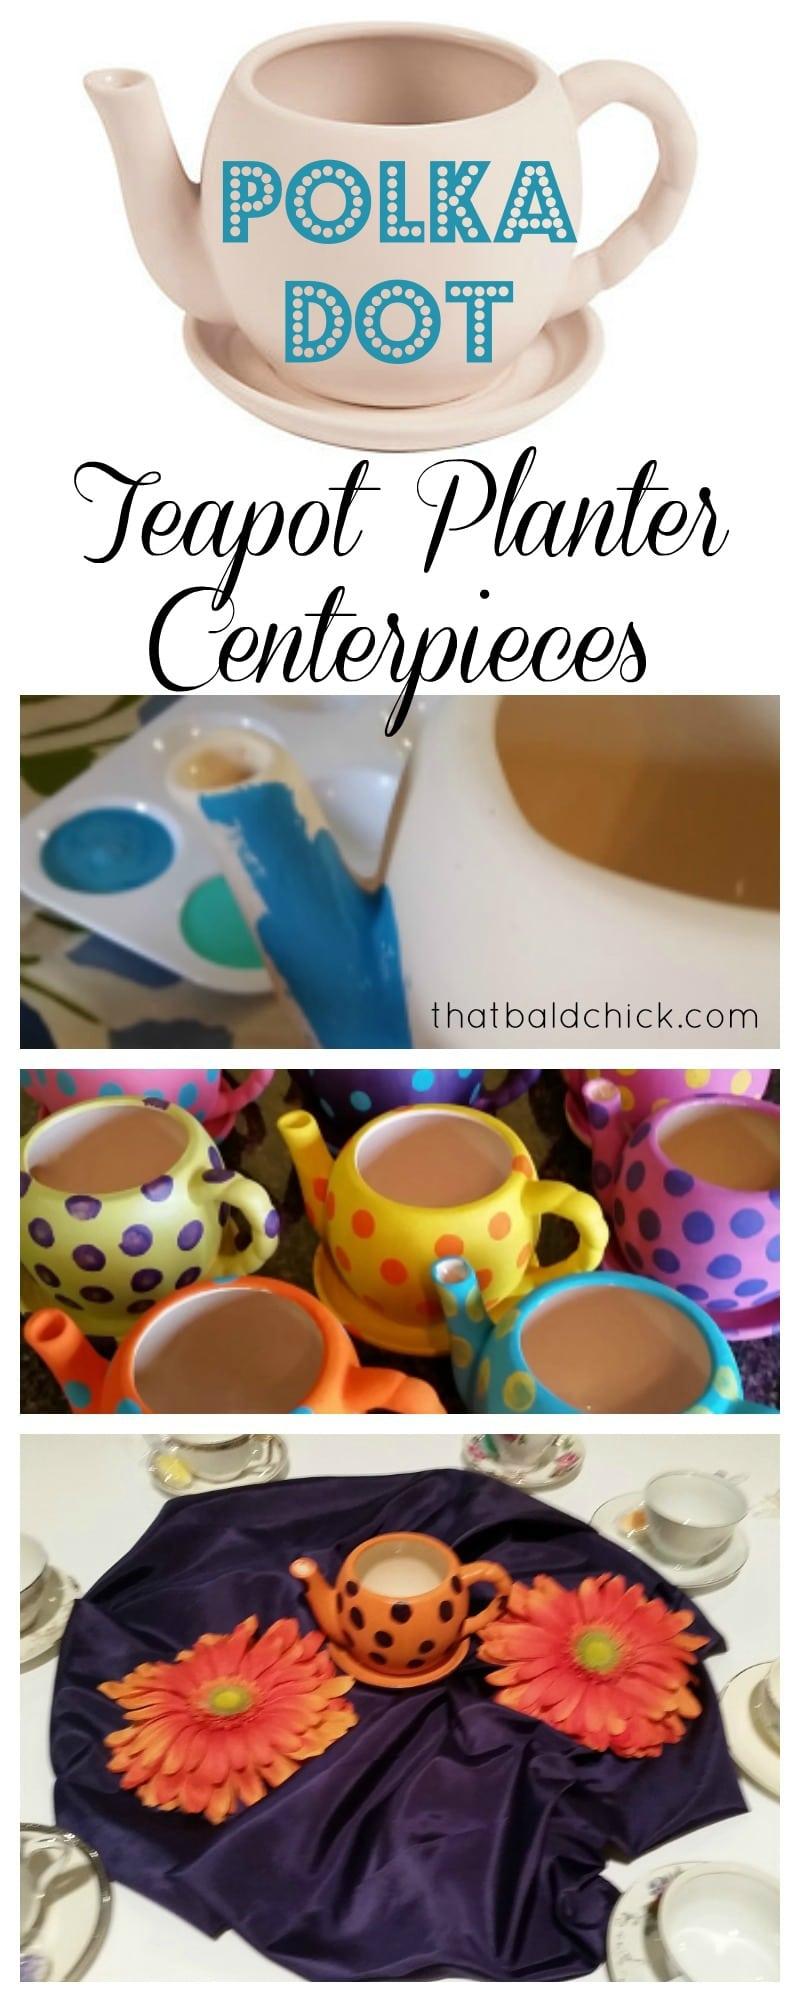 Polka Dot Teapot Planter Centerpieces at thatbaldchick.com